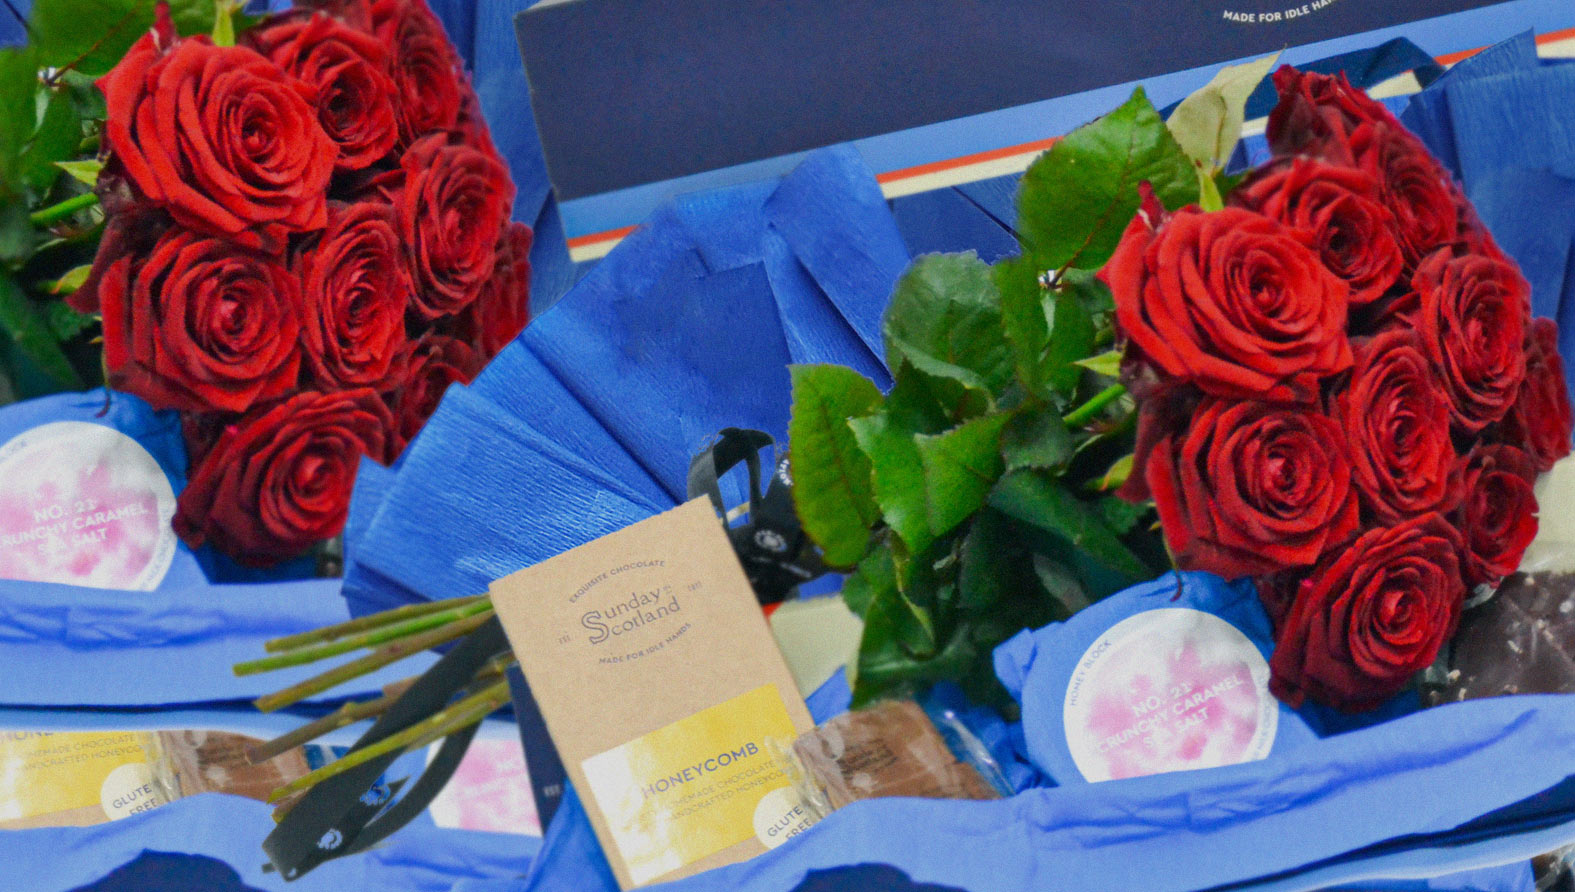 roses-choco-new-full.jpg